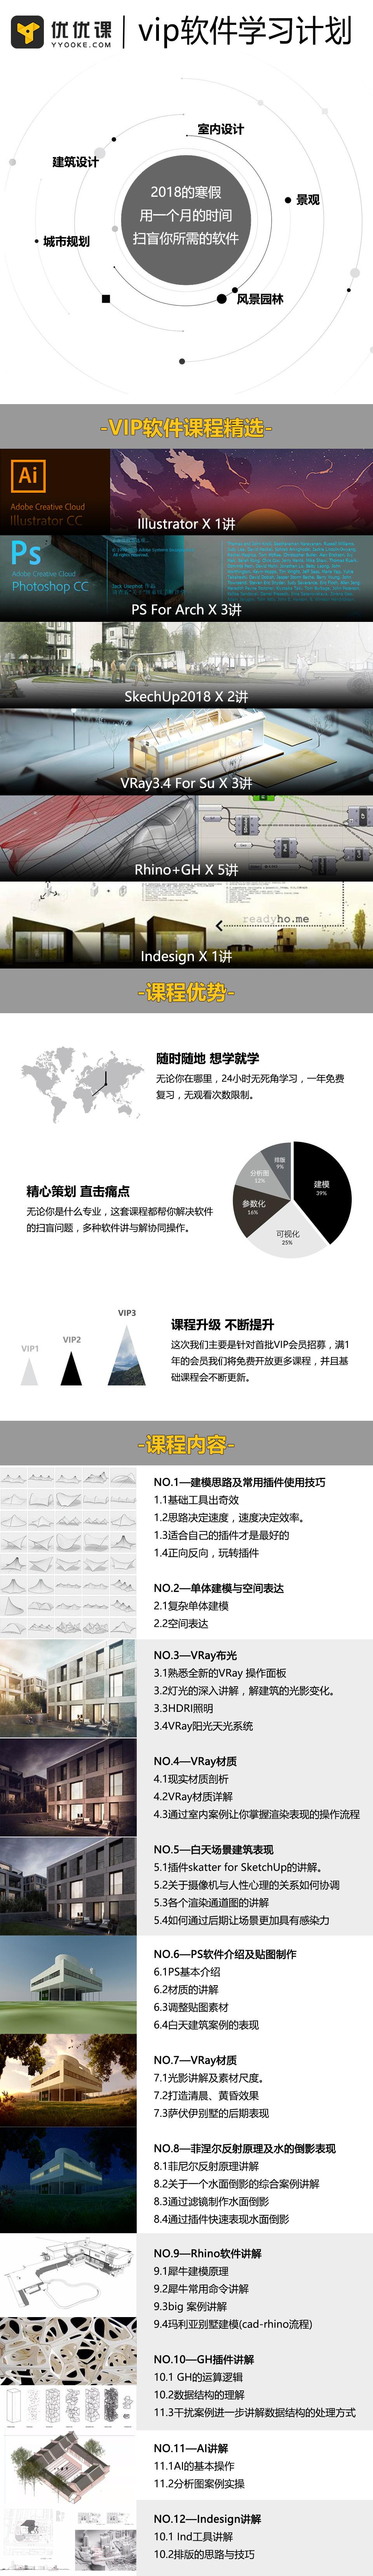 VIP课程图8.jpg